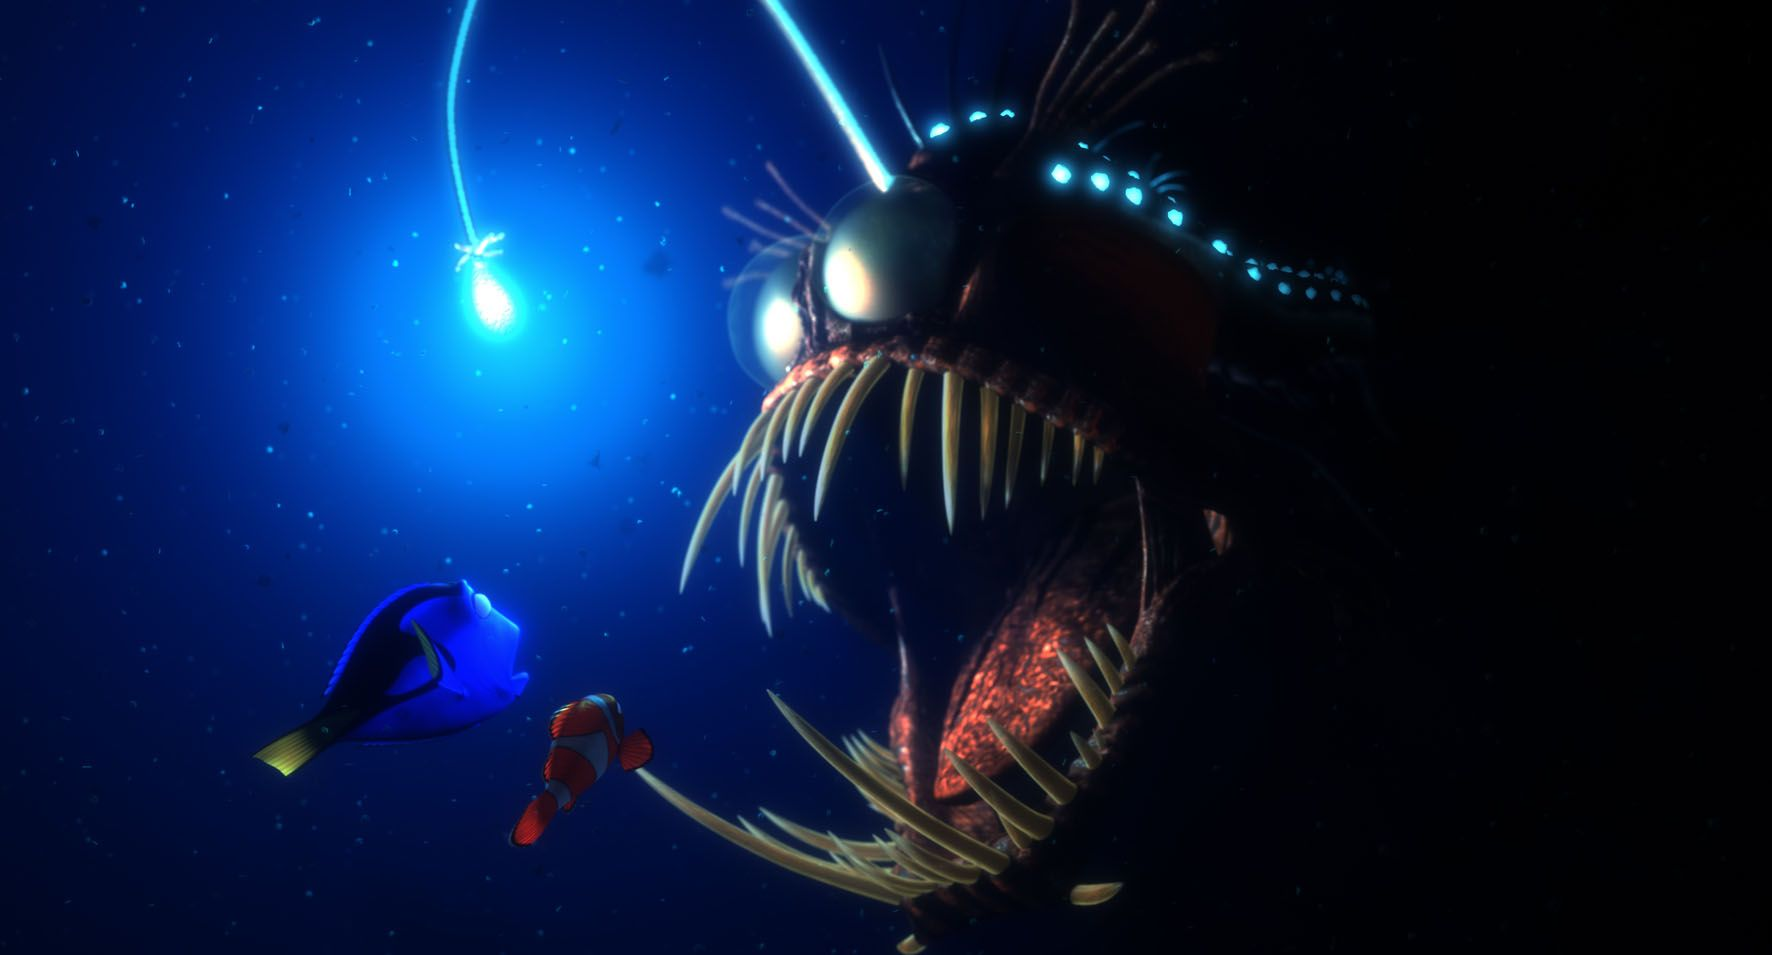 Finding nemo disney pixar movies pinterest finding for Finding nemo angler fish